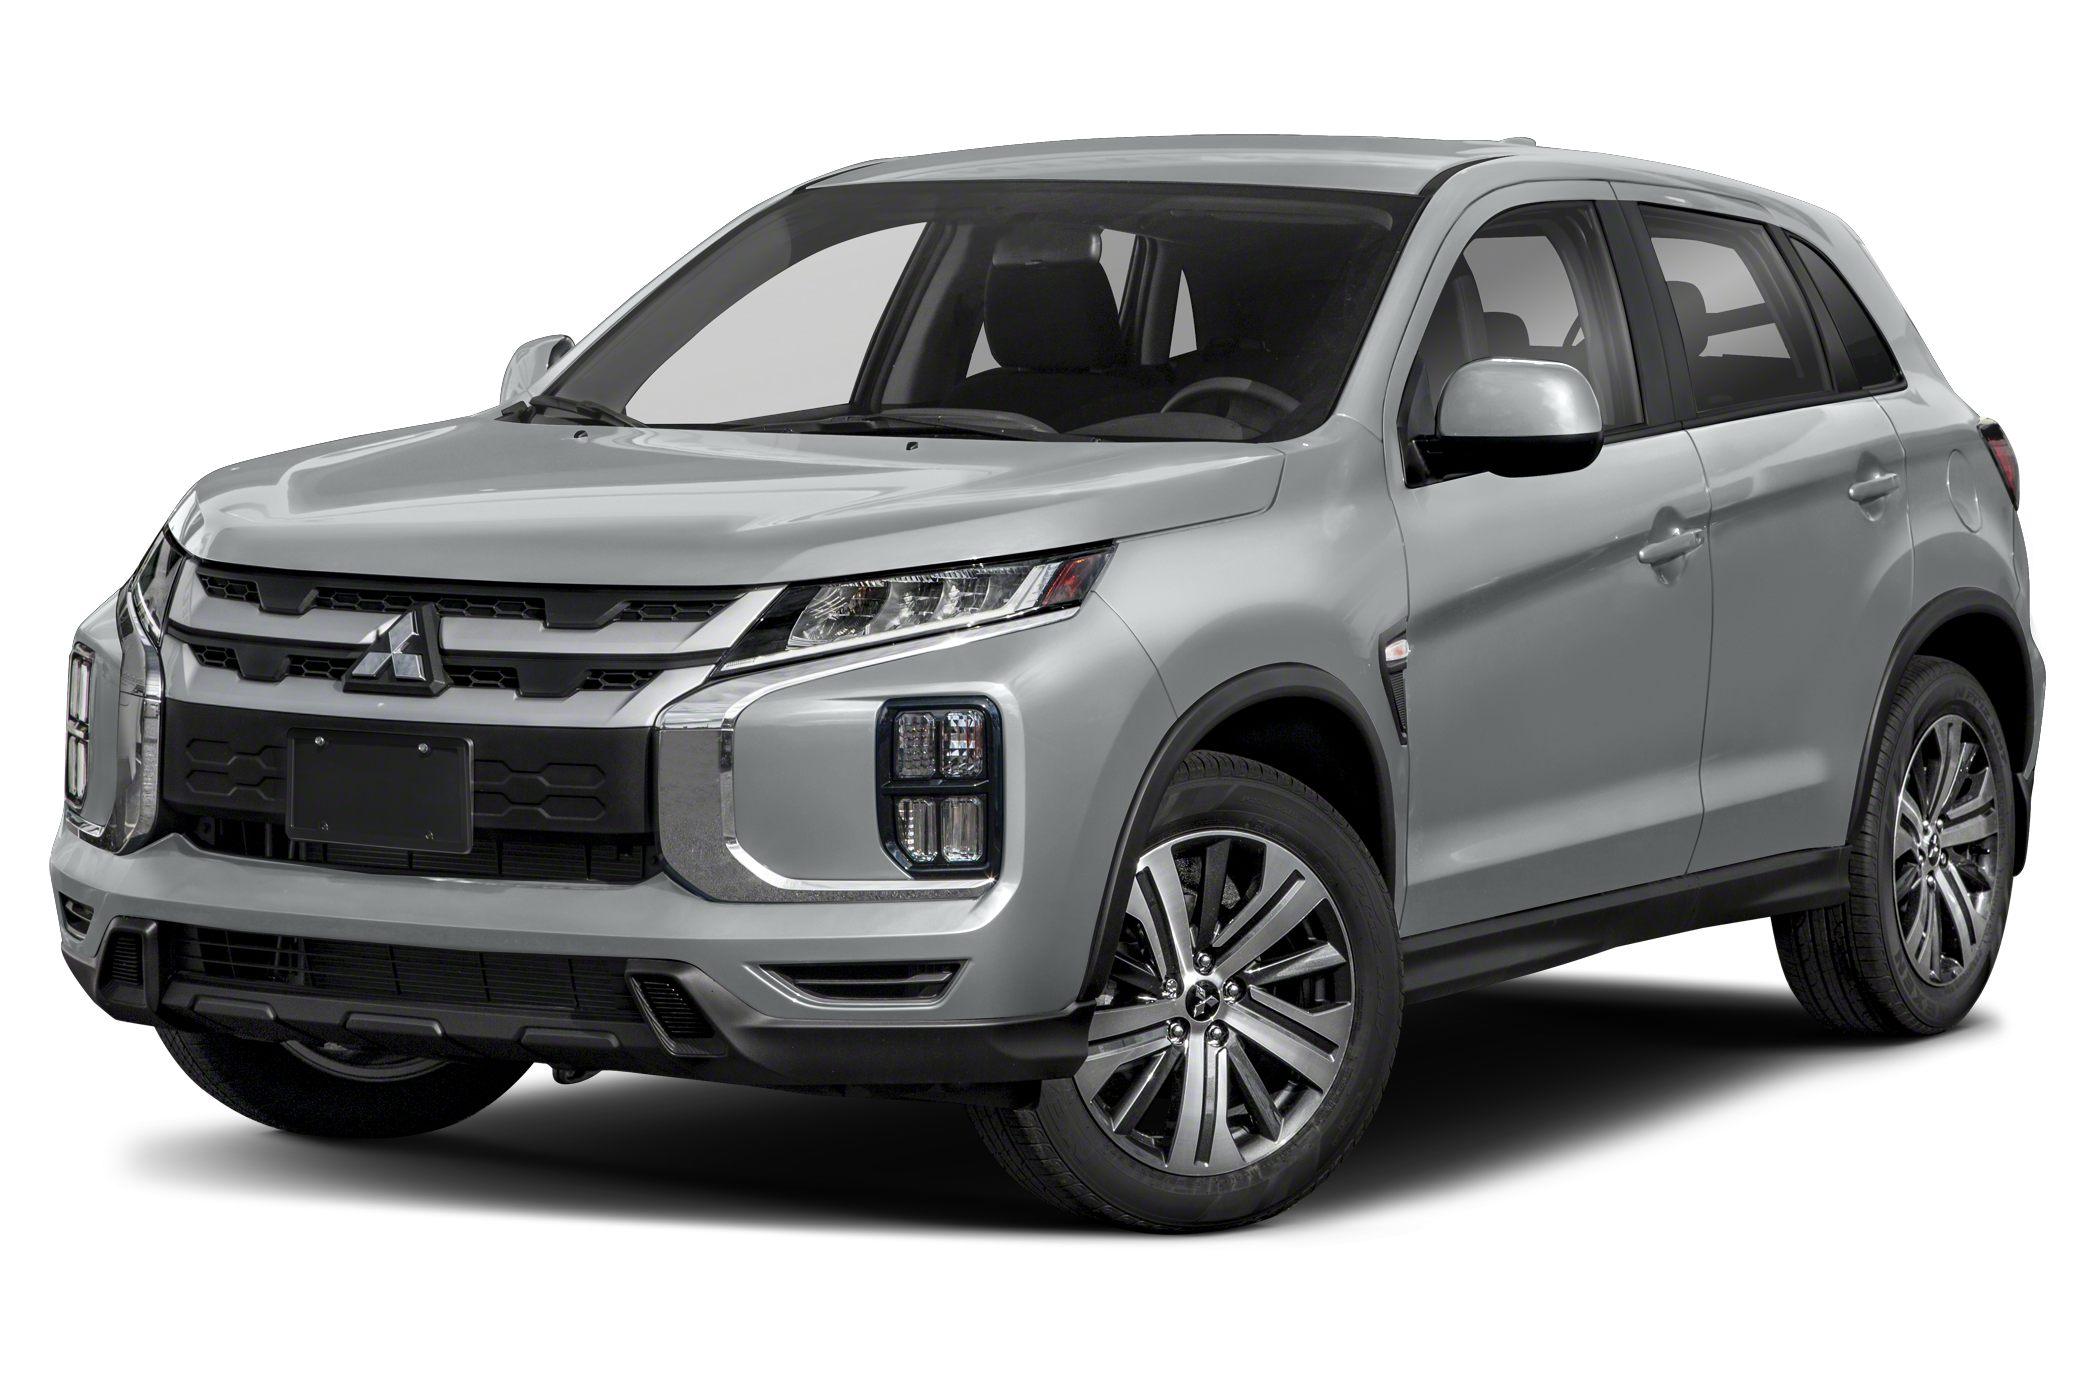 2020 Mitsubishi Outlander Sport Prices